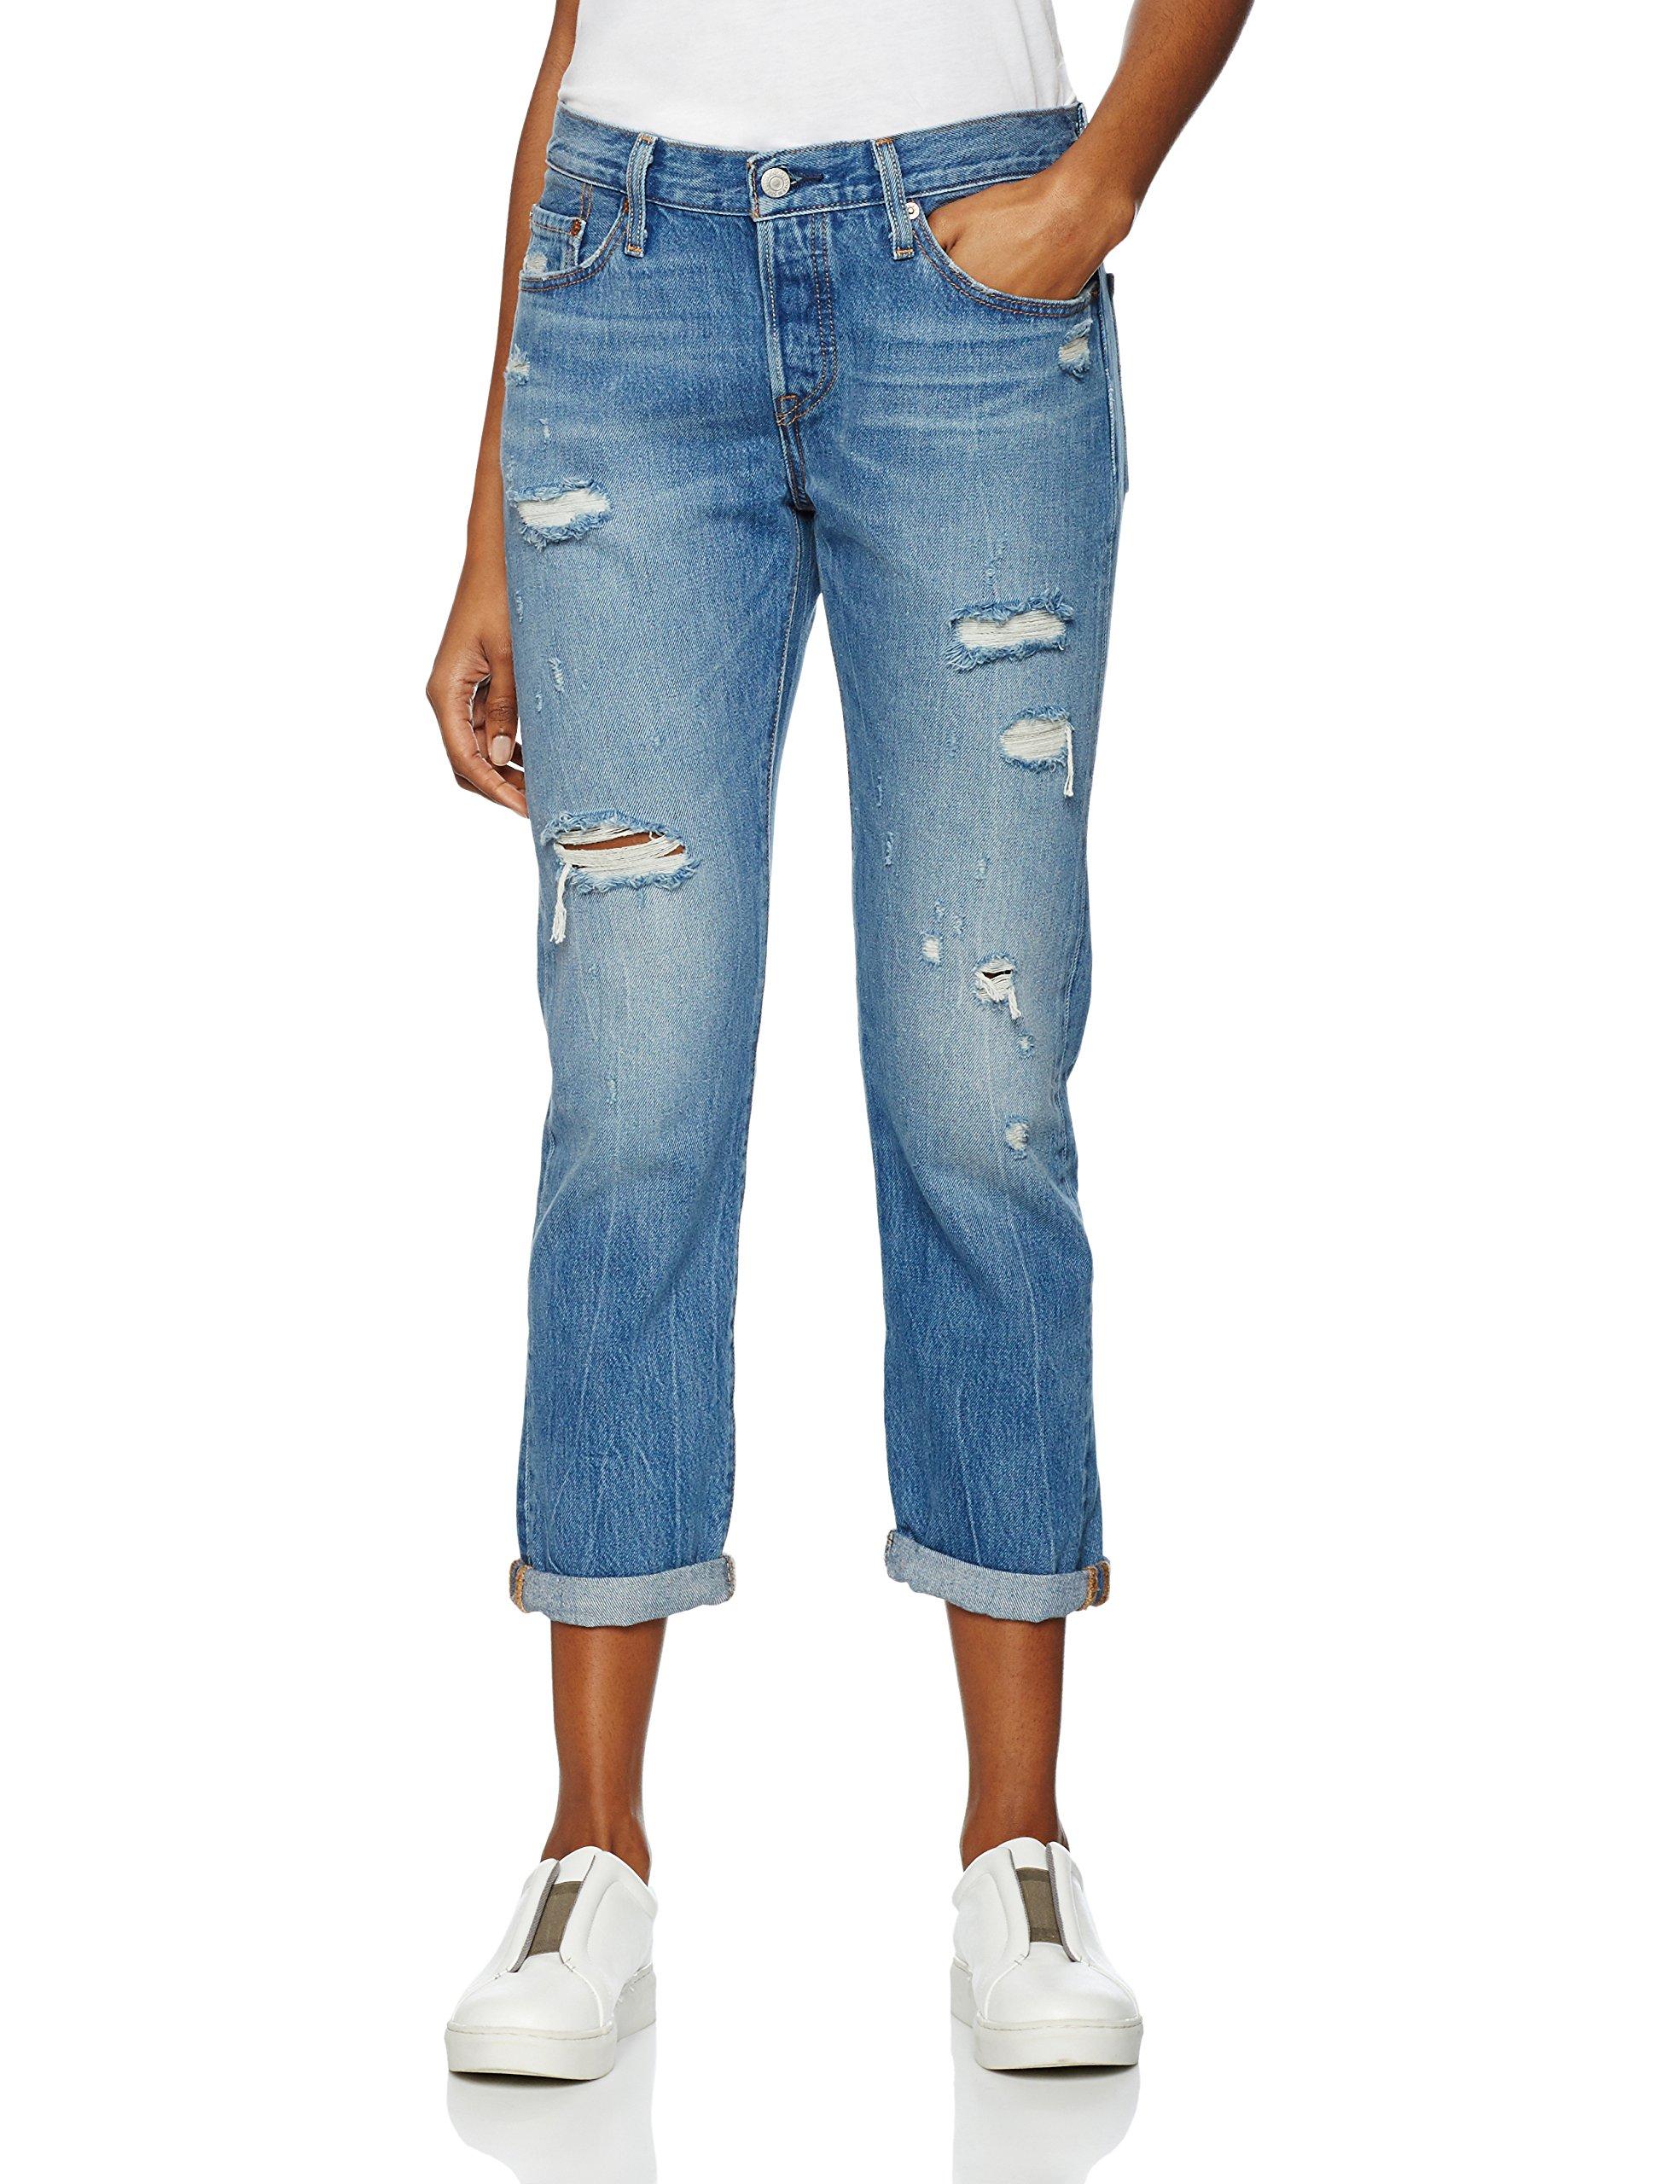 0073 Femme l34 Ct Levi's17804 StarW30 Bleuradio 501 Jeans vgYbf76y